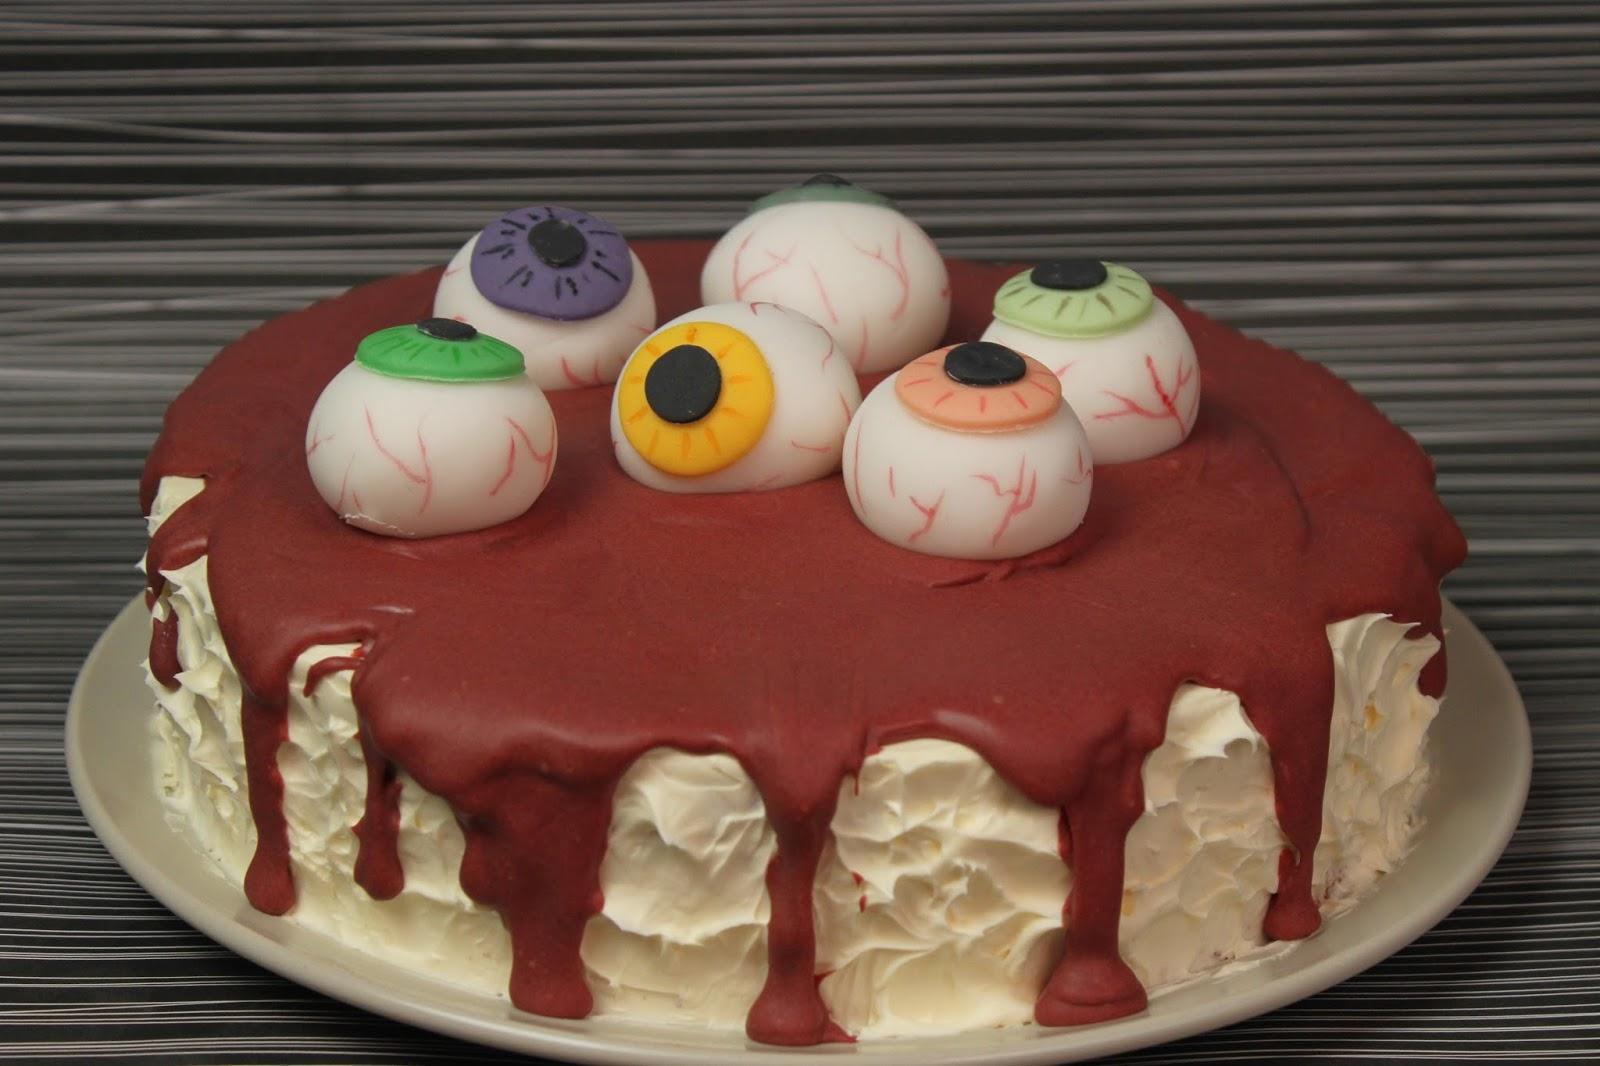 halloween essen blutige halloweentorte mit aug pfeln red velvet cake rezept jamblog. Black Bedroom Furniture Sets. Home Design Ideas